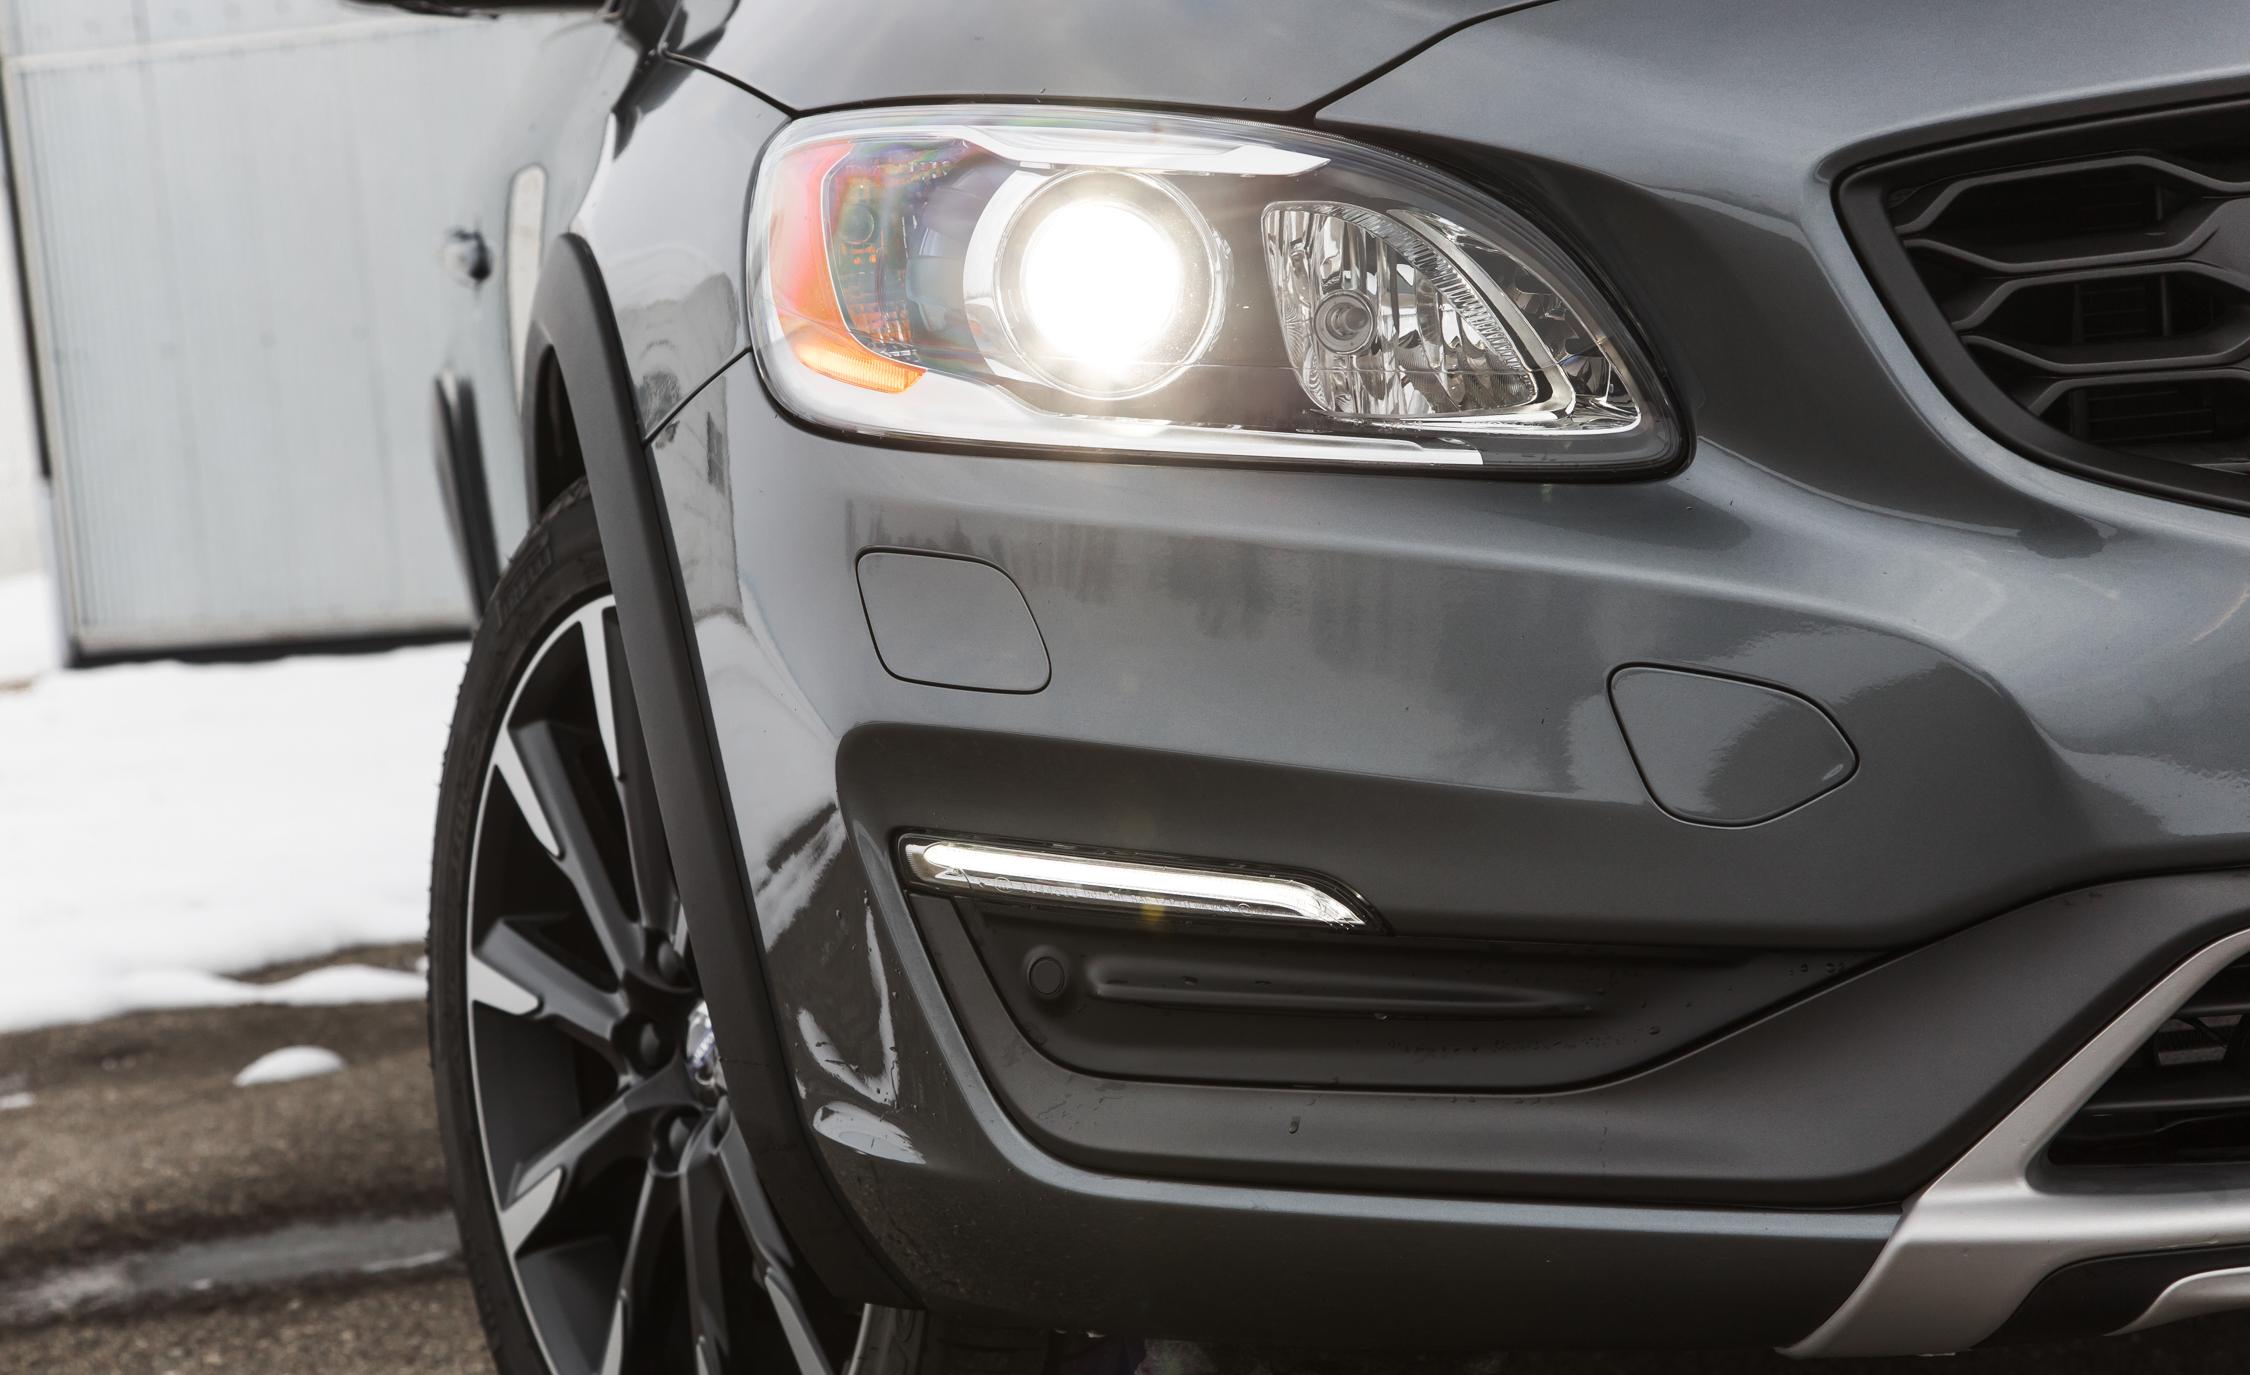 2016 Volvo S60 Cross Country Exterior Headlight